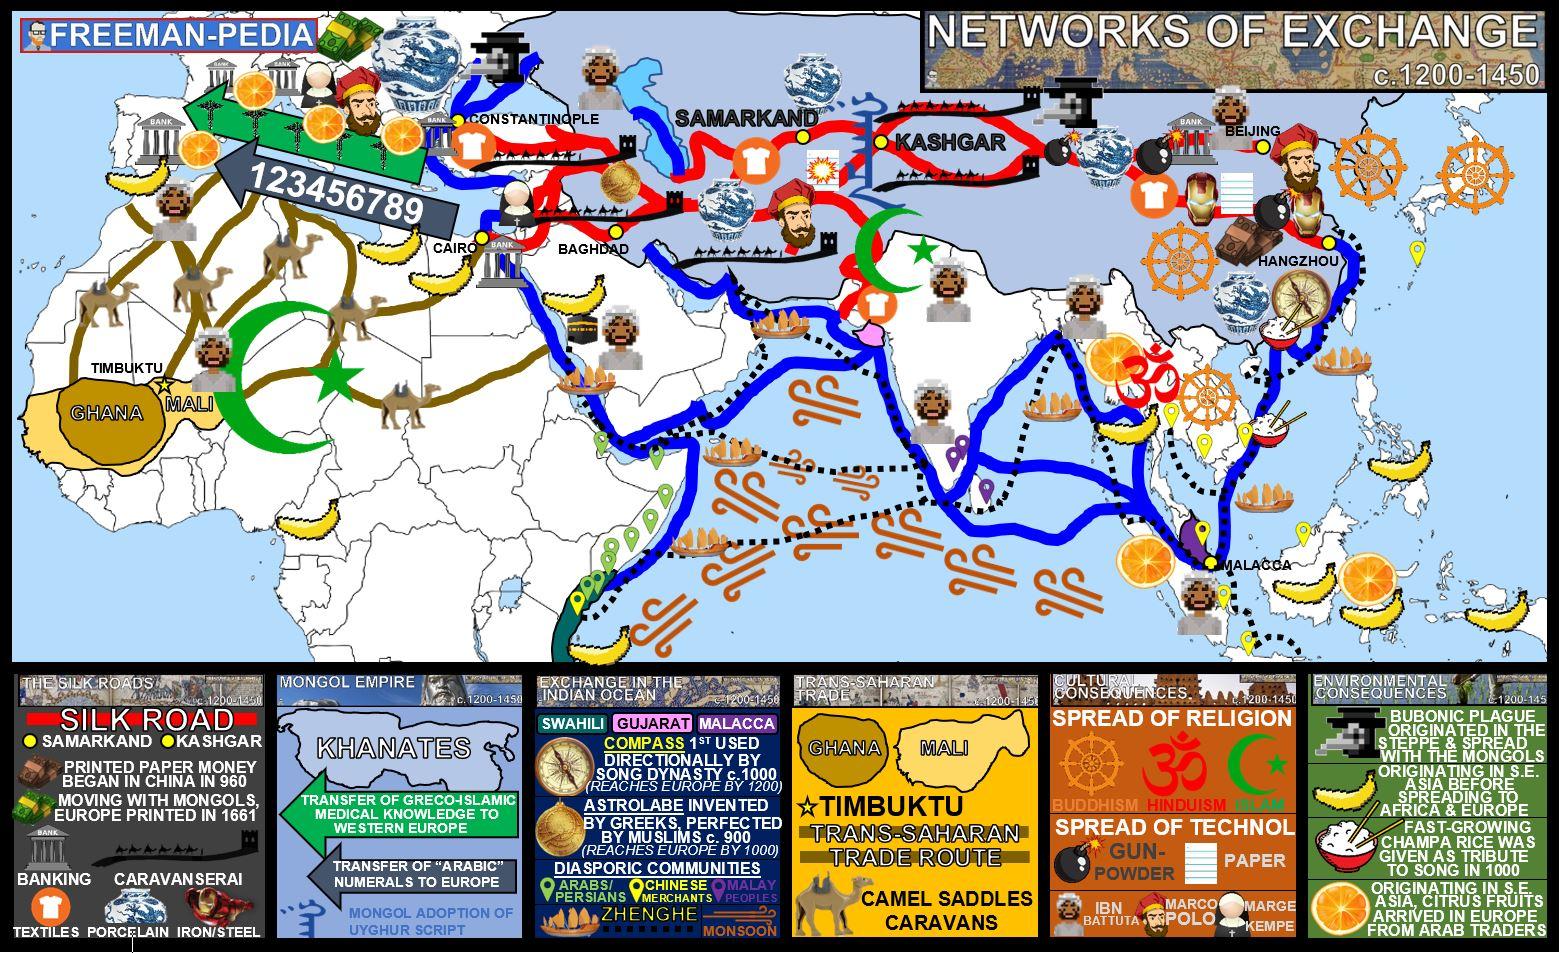 NETWORKS OF EXCHANGE MAP AP WORLD HISTORY MODERN FREEMANPEDIA.JPG